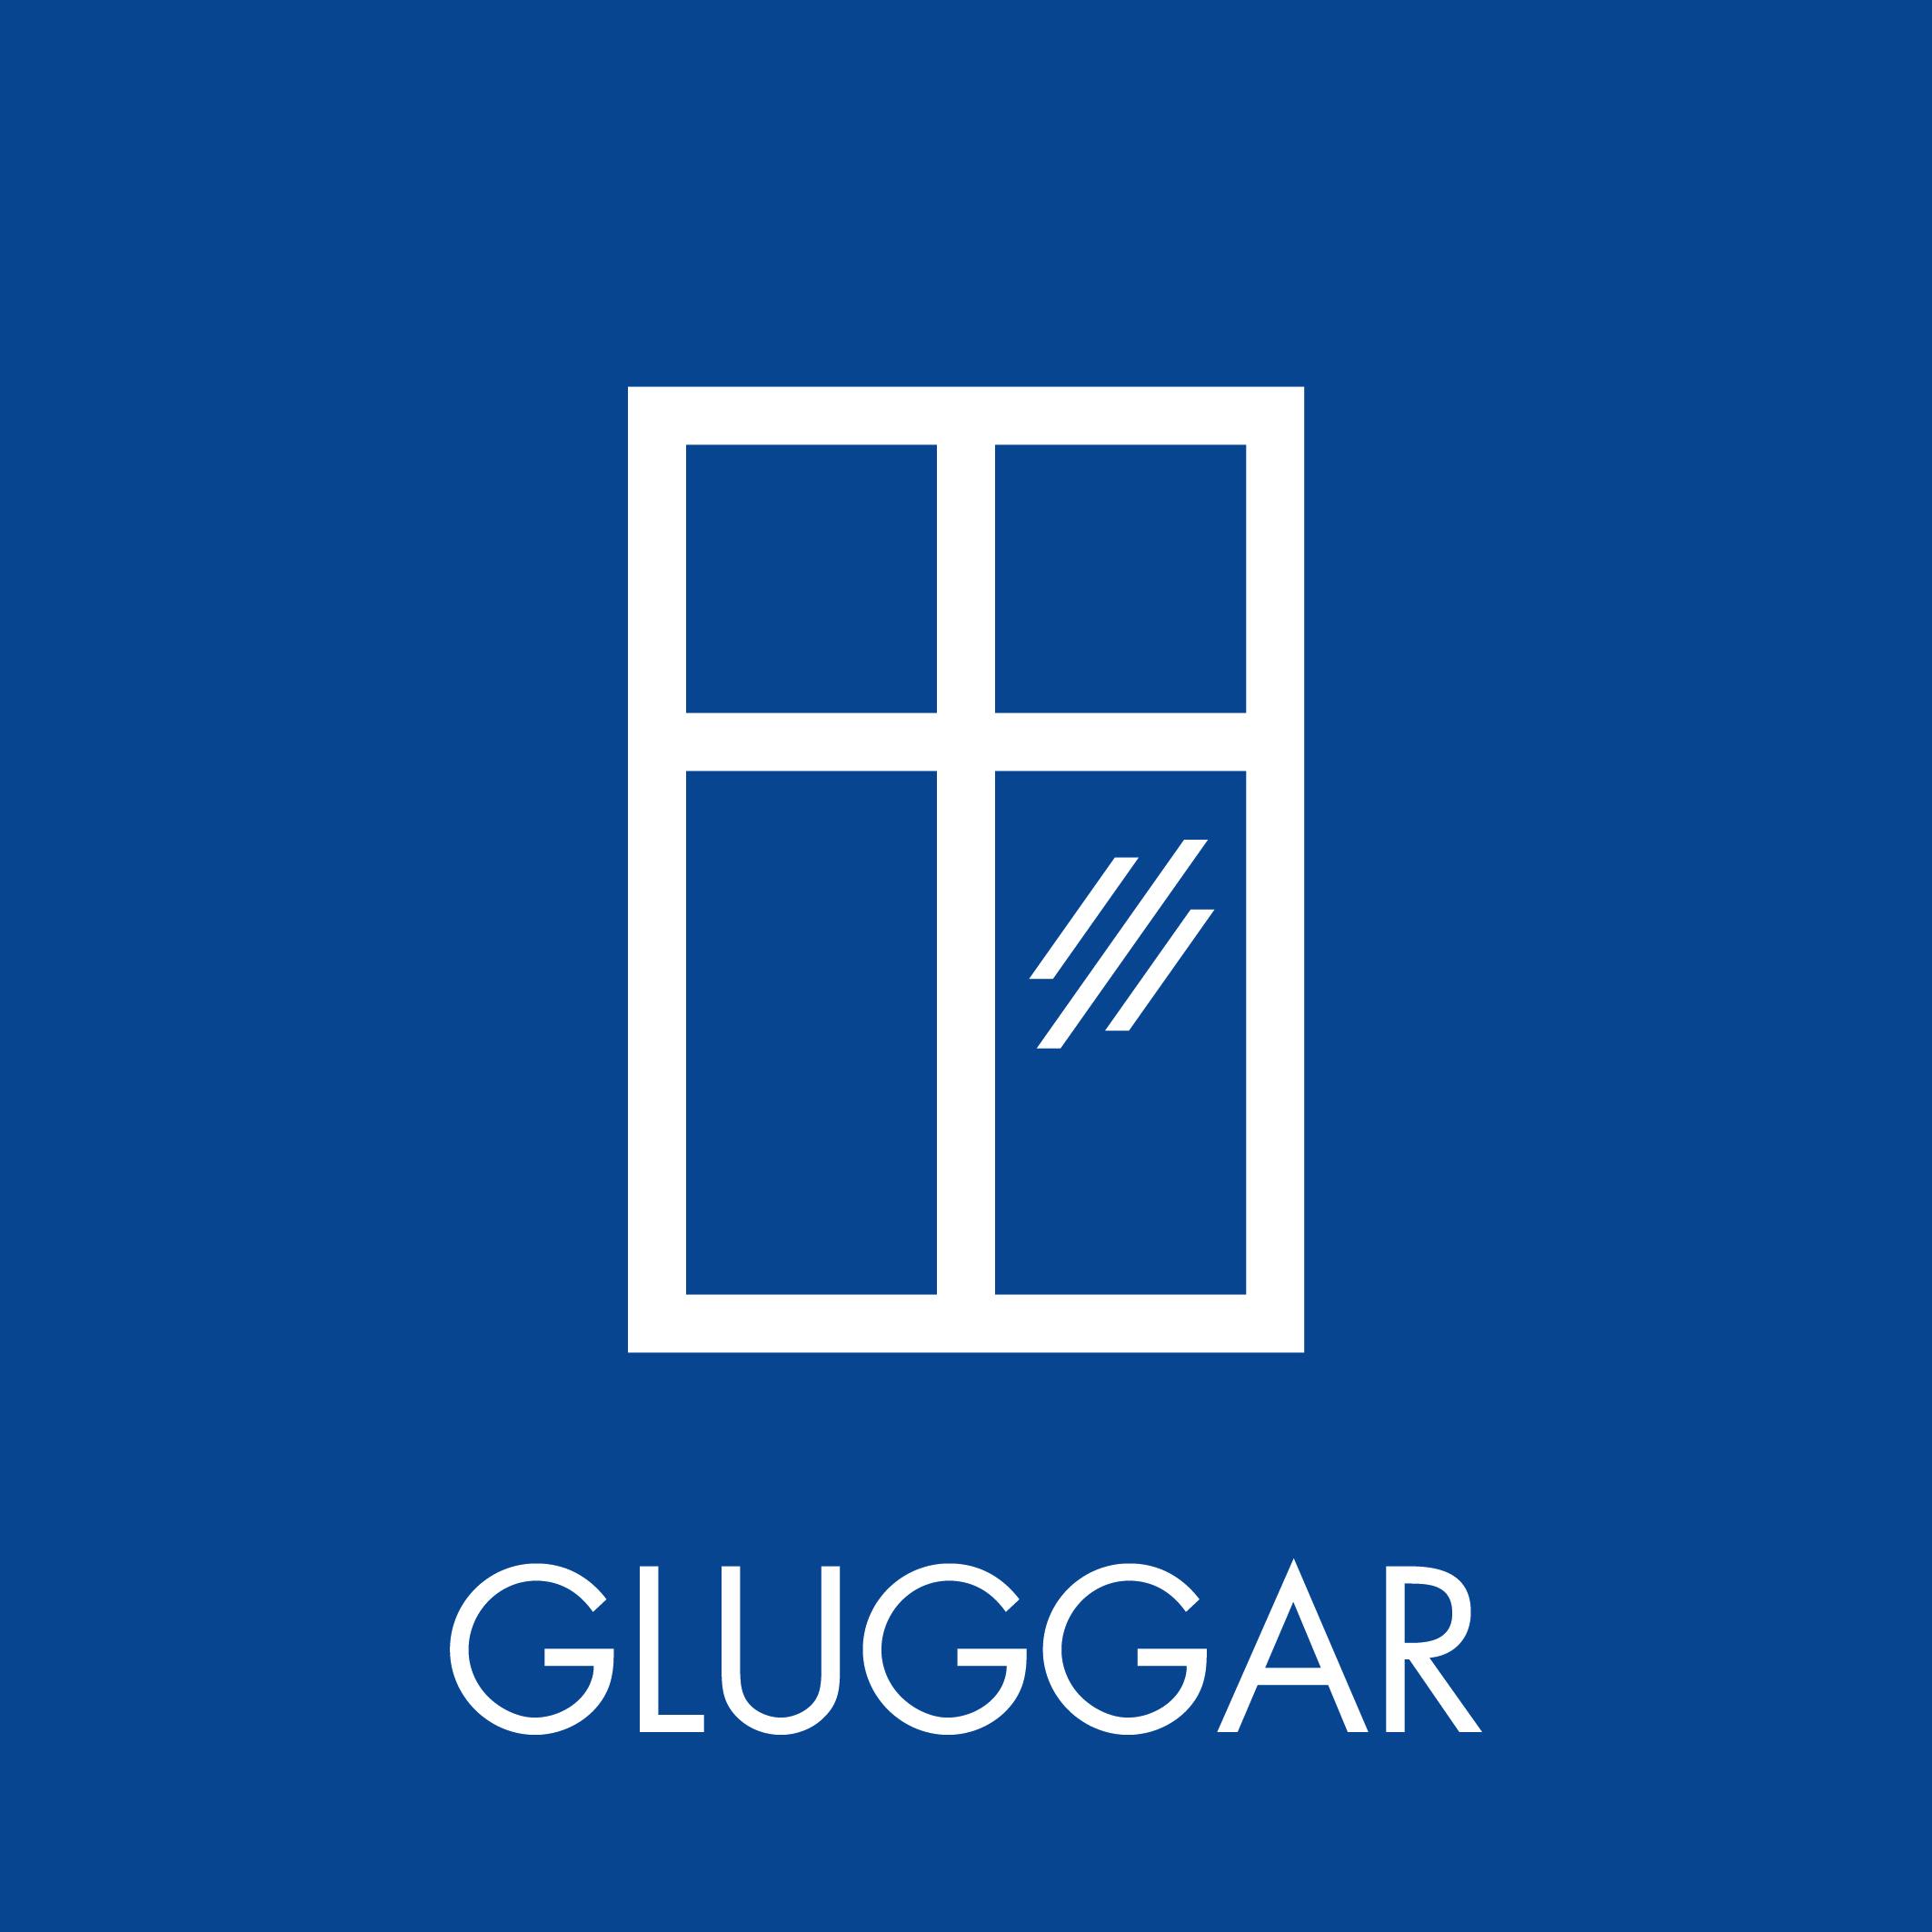 Gluggar